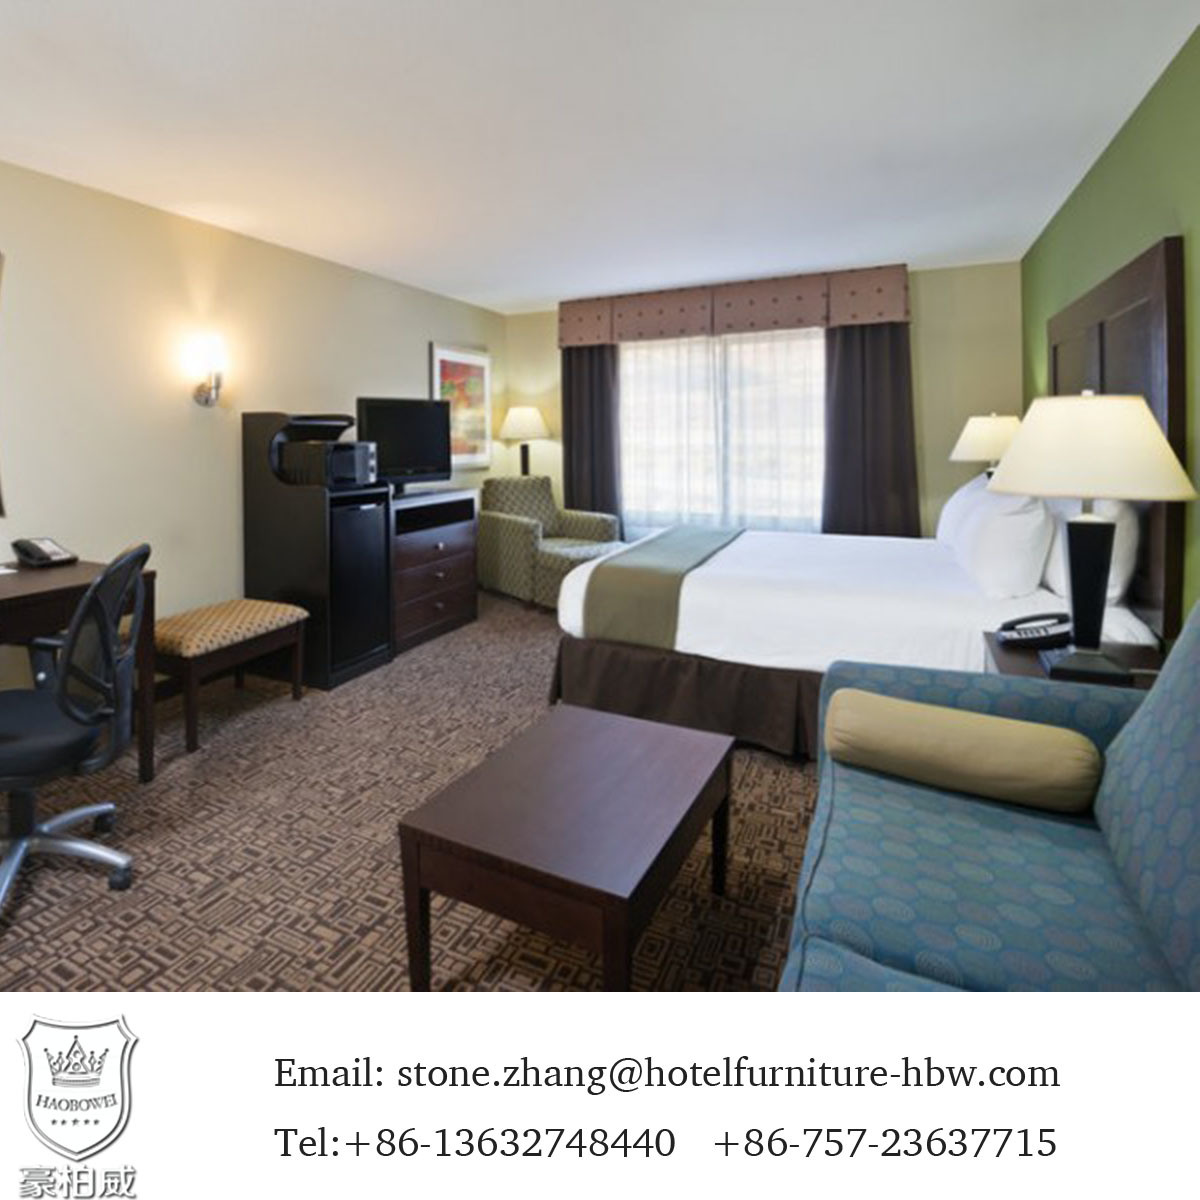 Classic Design Wooden Hotel Bedroom Furniture Sets for Sale